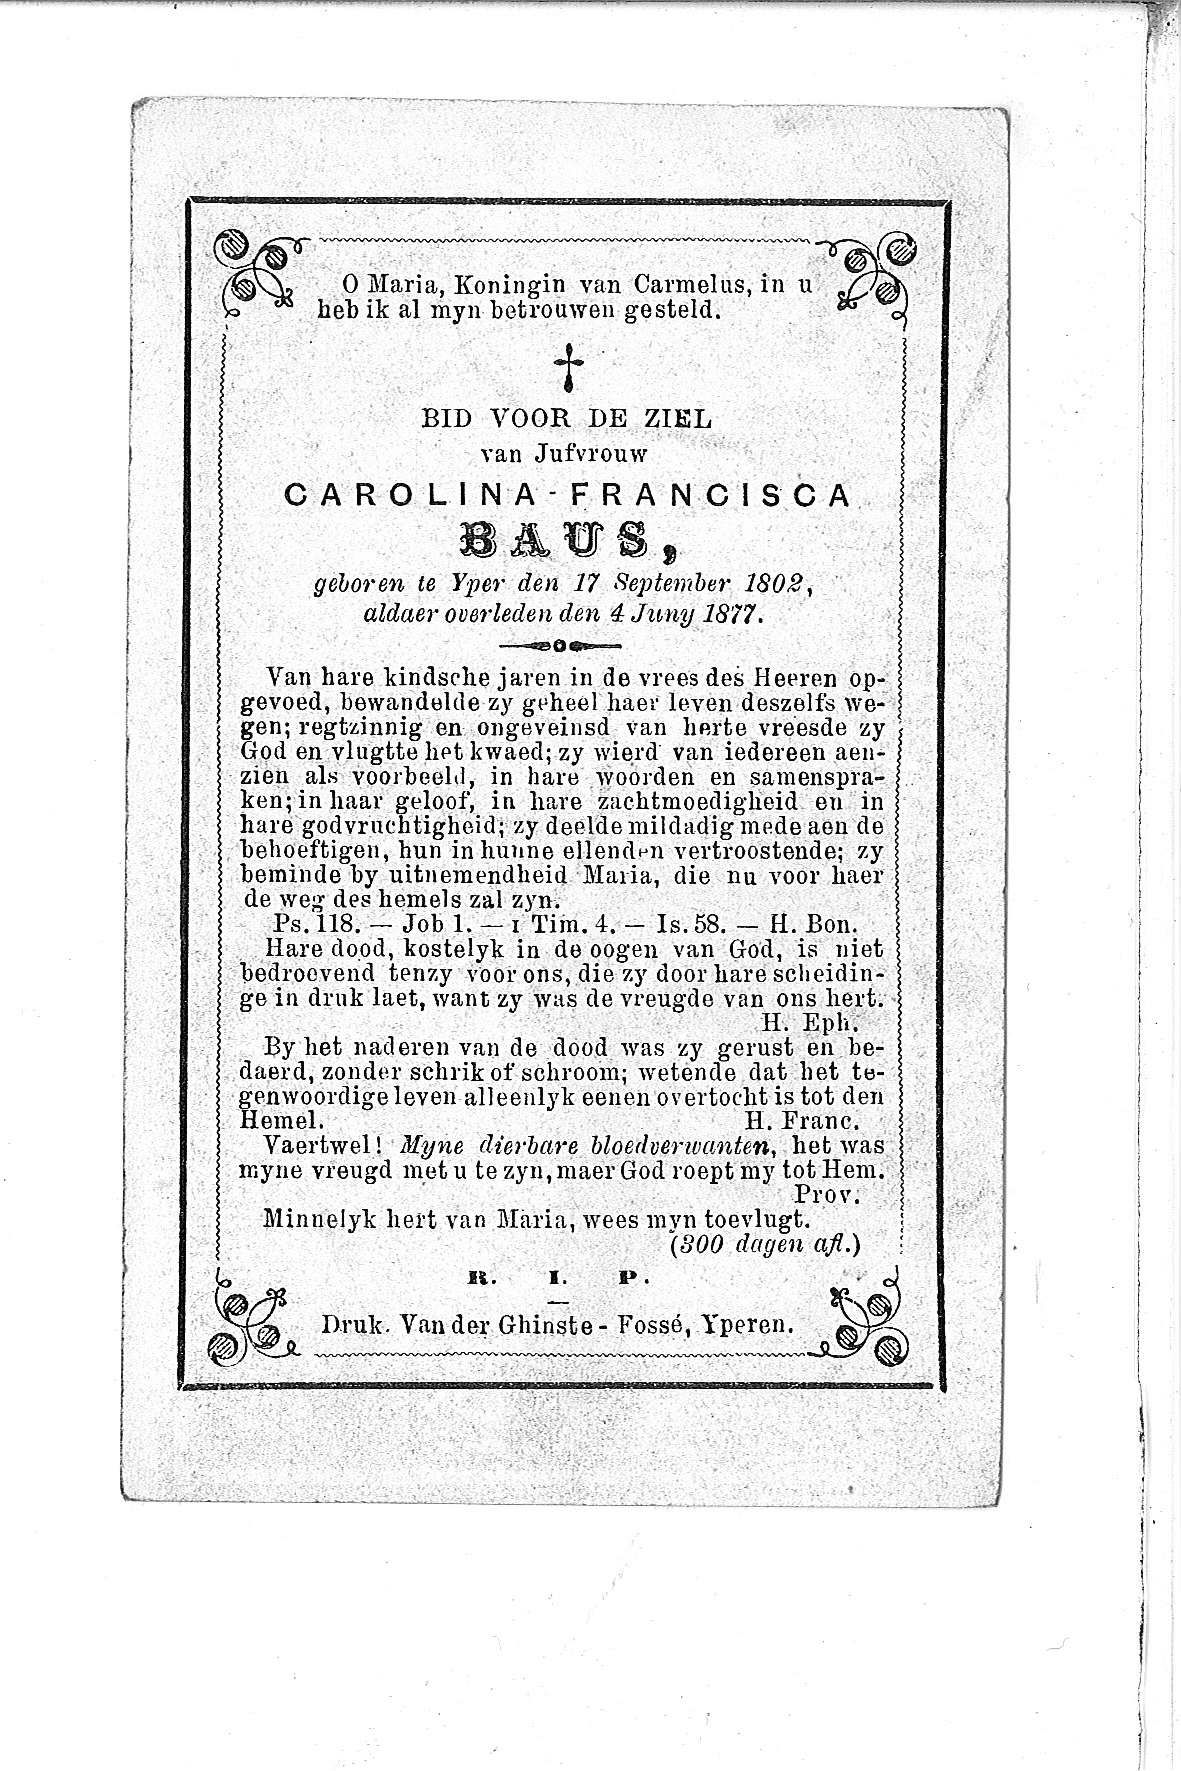 Carolina-Francisca(1877)20101025132446_00007.jpg